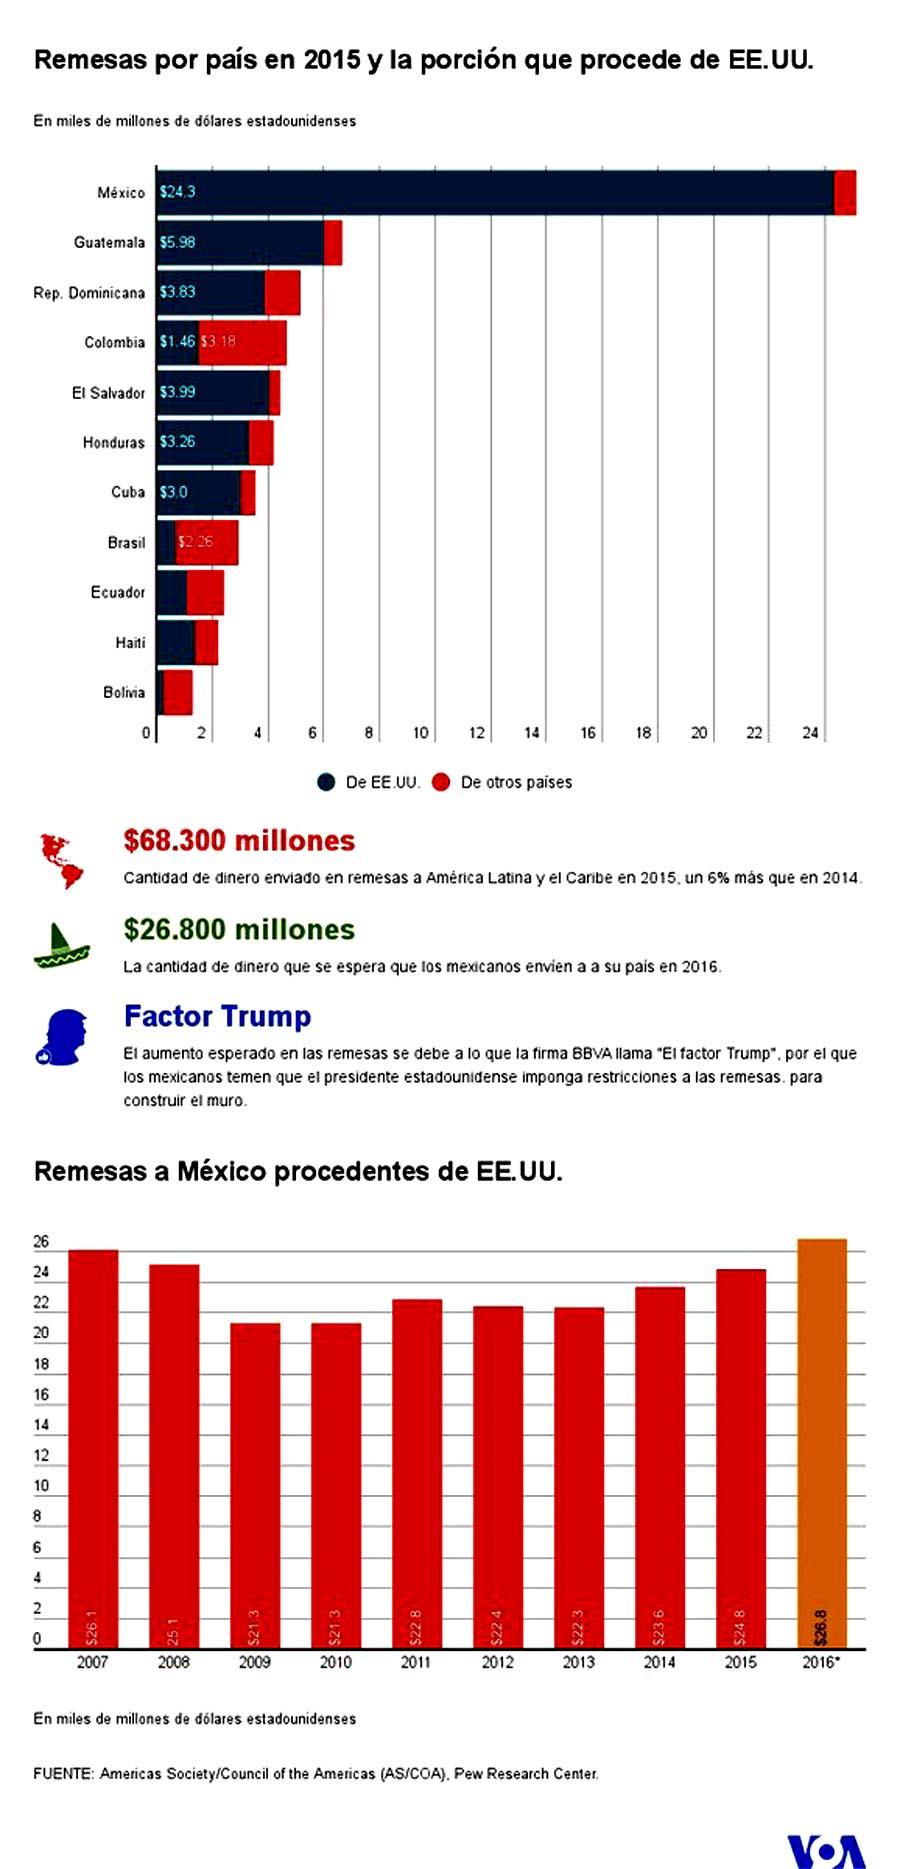 Remesas a Latinoamerica